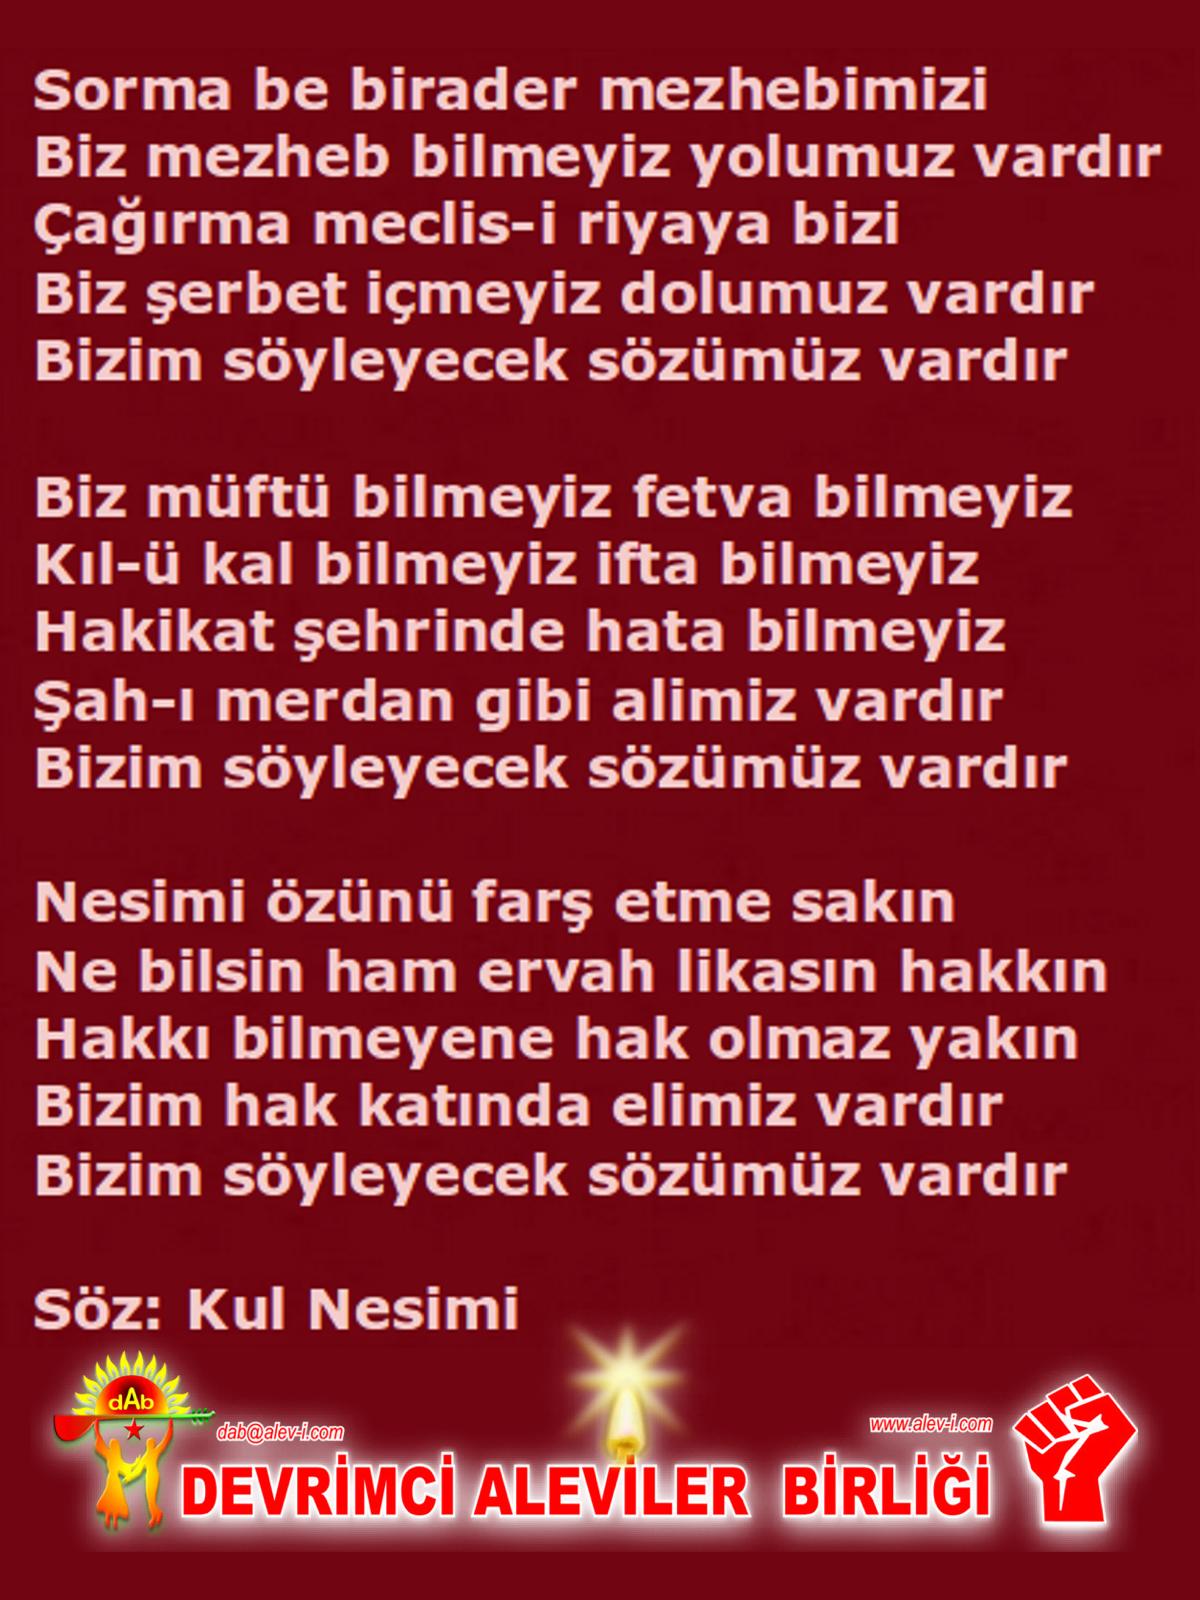 Alevi Bektaşi Kızılbaş Pir Sultan Devrimci Aleviler Birliği DAB nesimi xxx